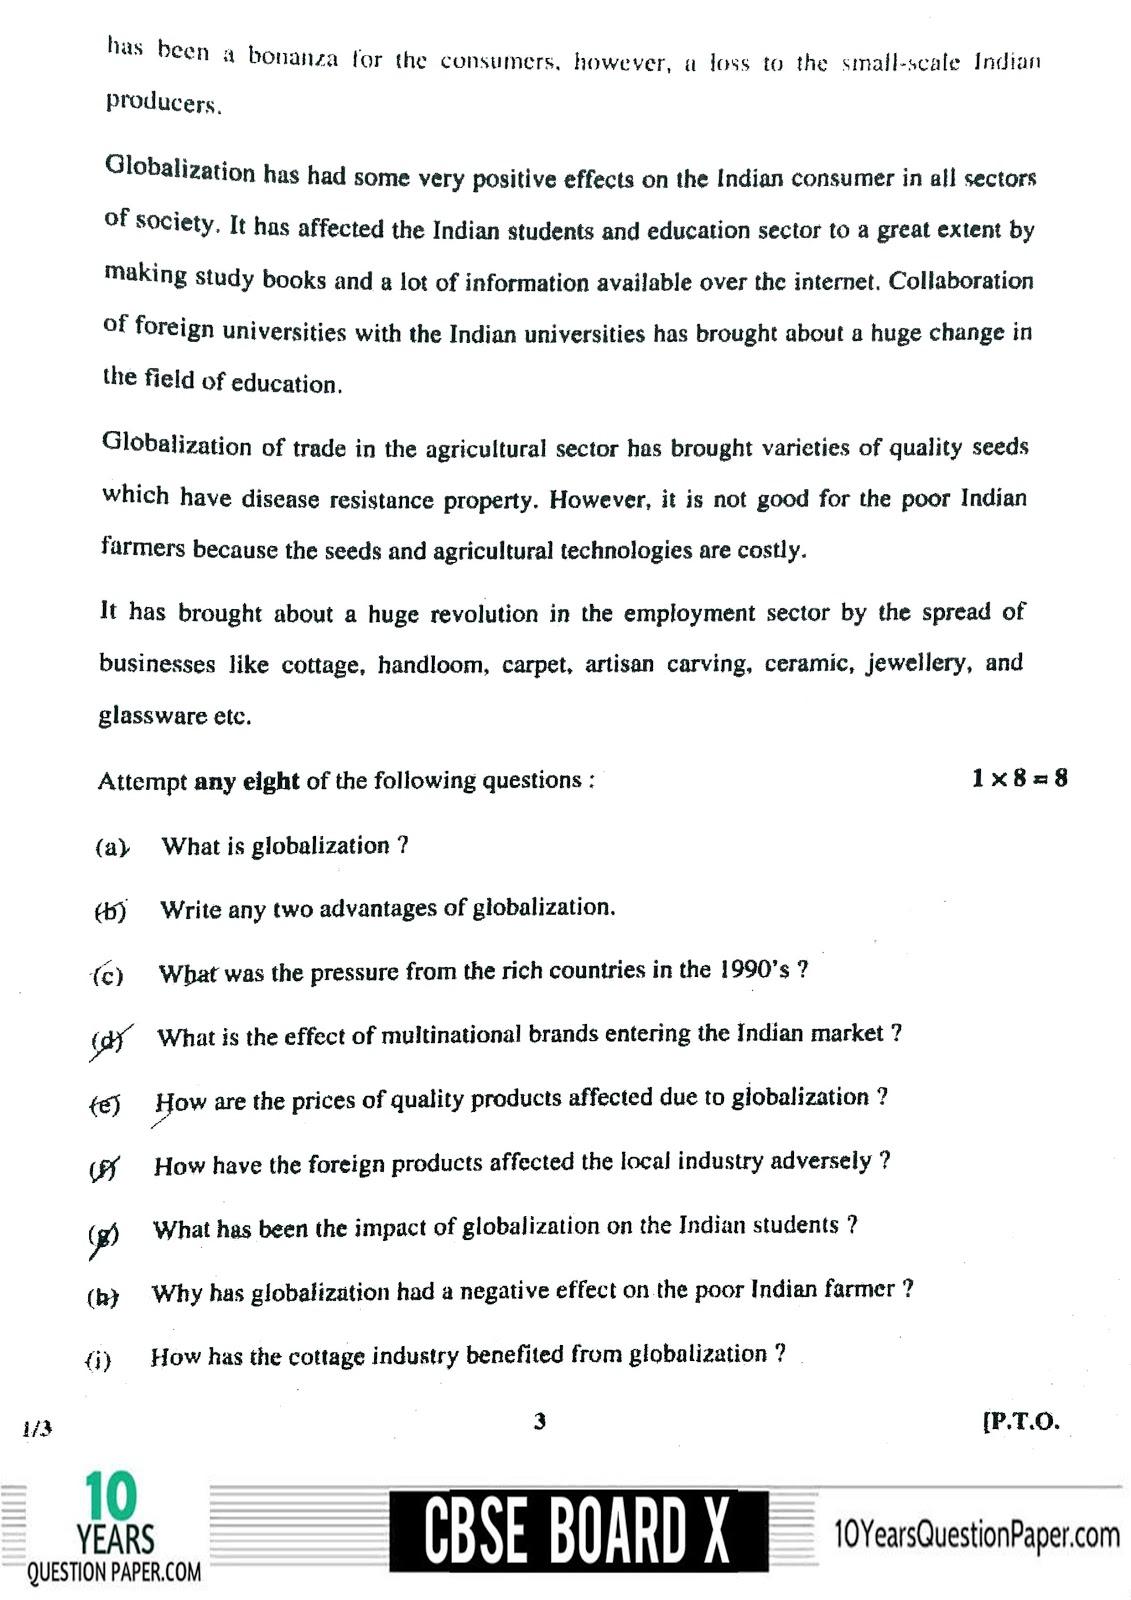 CBSE Board 2018 English Communicative Question paper Class 10 Page-03